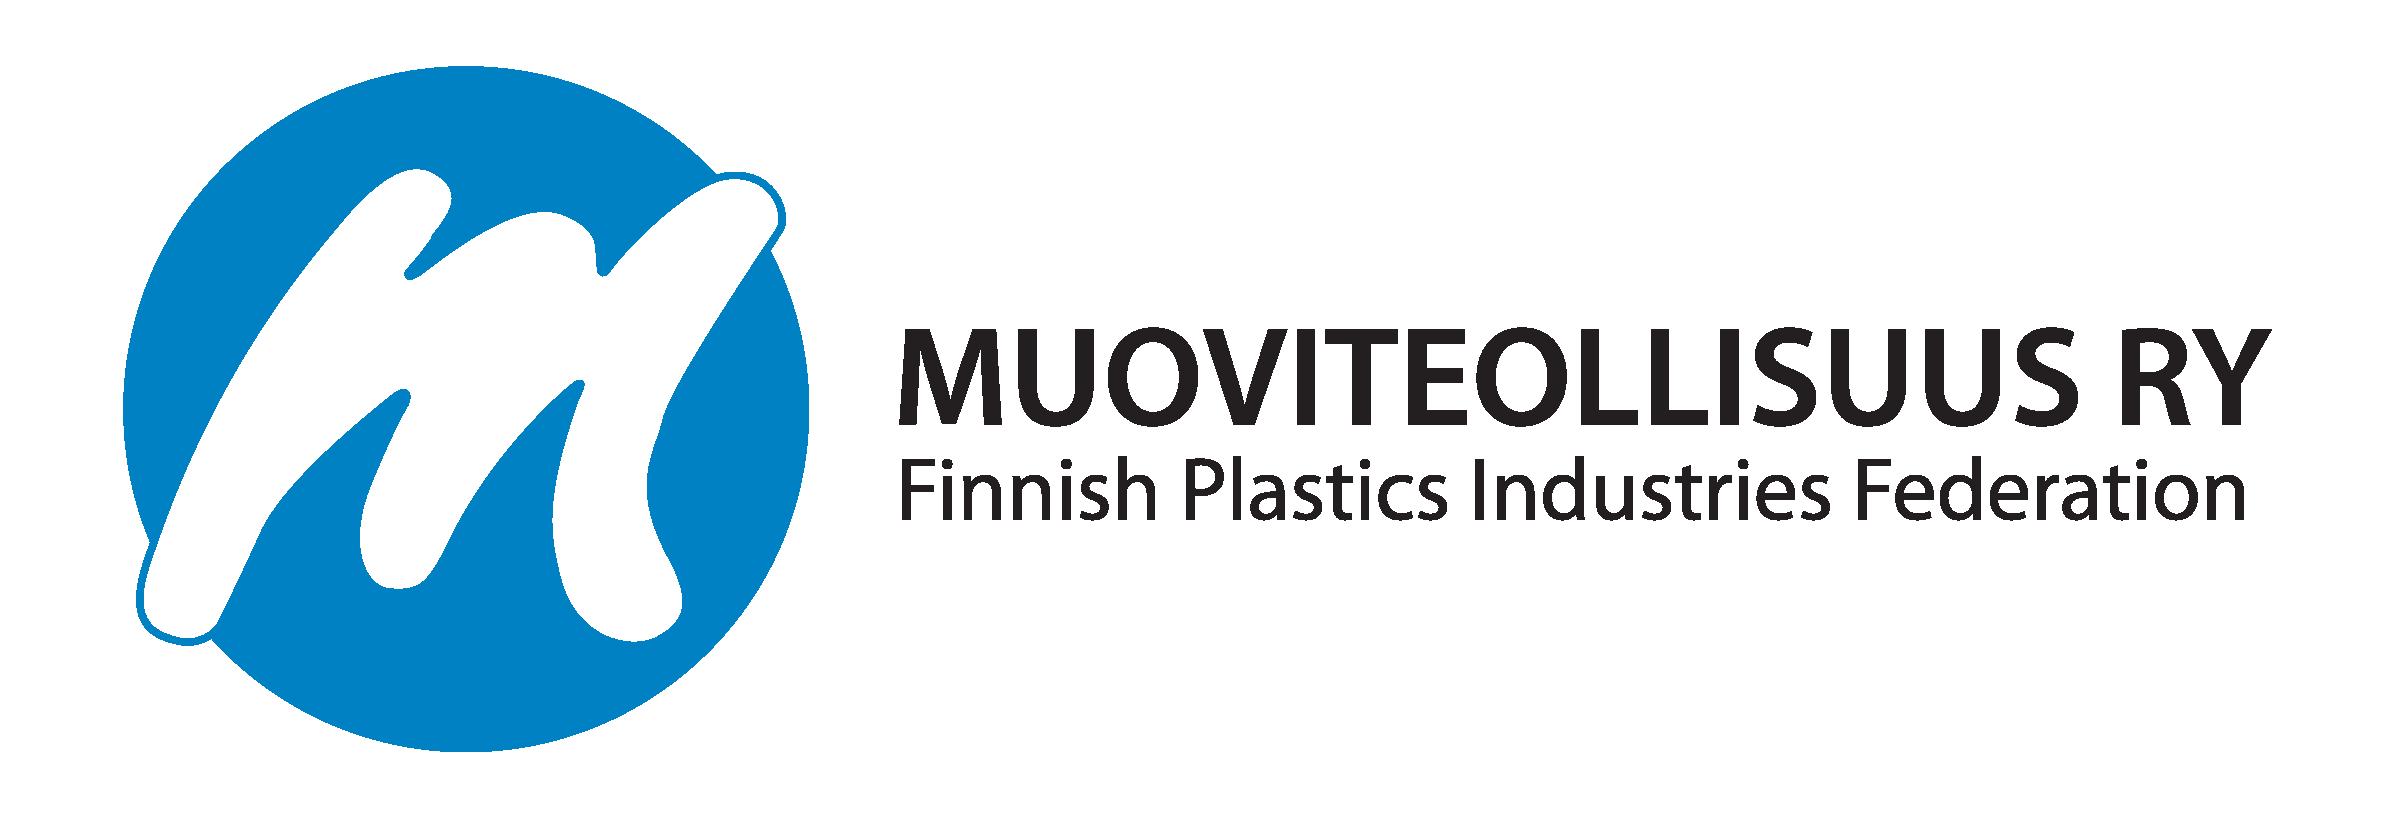 https://europeanplasticspact.org/wp-content/uploads/2021/05/finnish-plastics-industry-federation_muovi_logo.png